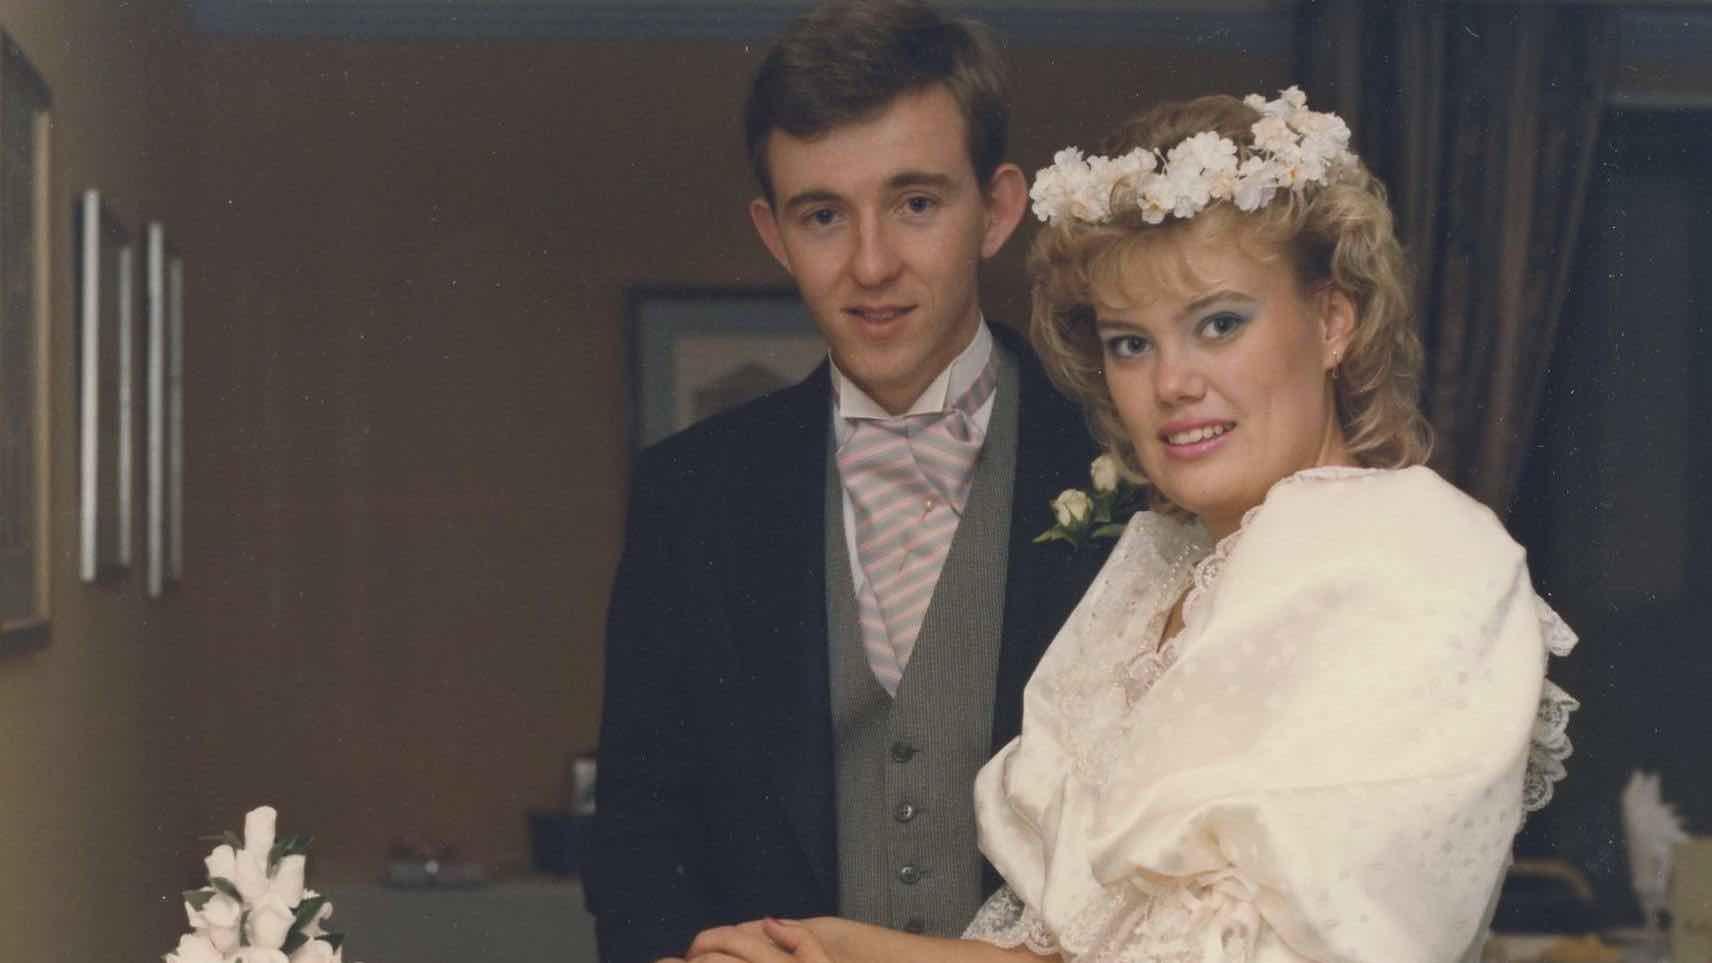 wedding photo 1987